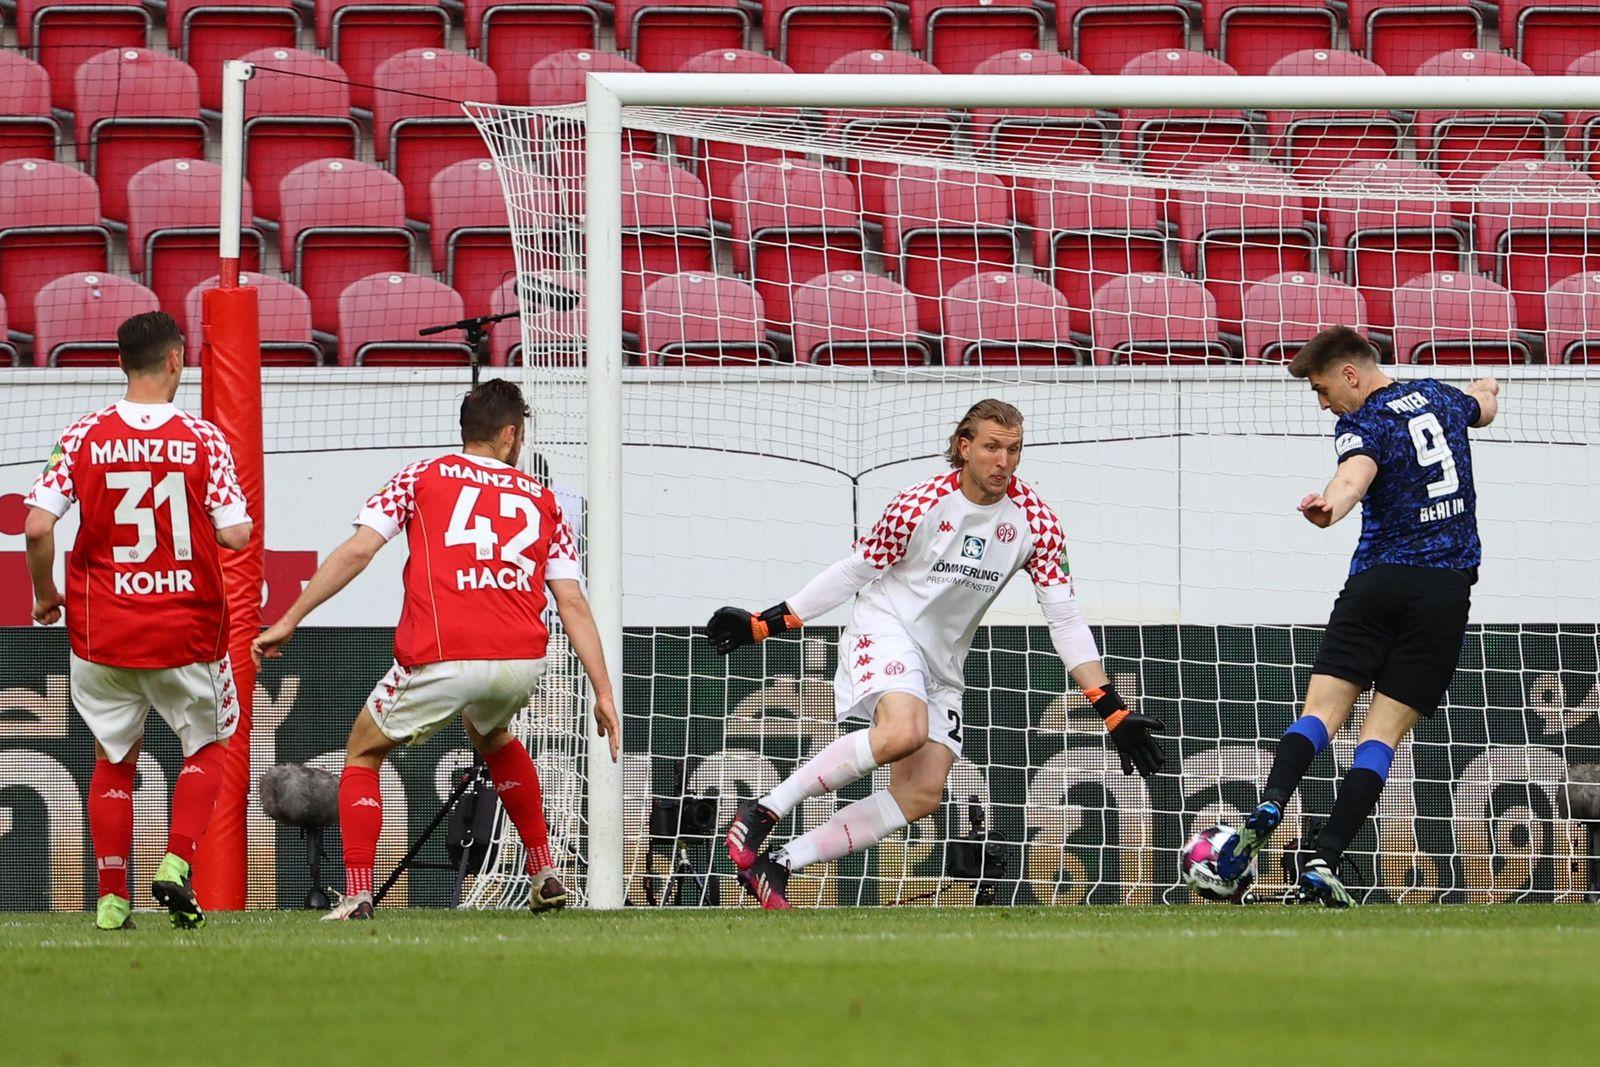 Football: Bundesliga - day 29: Mainz 05 v Hertha Berlin